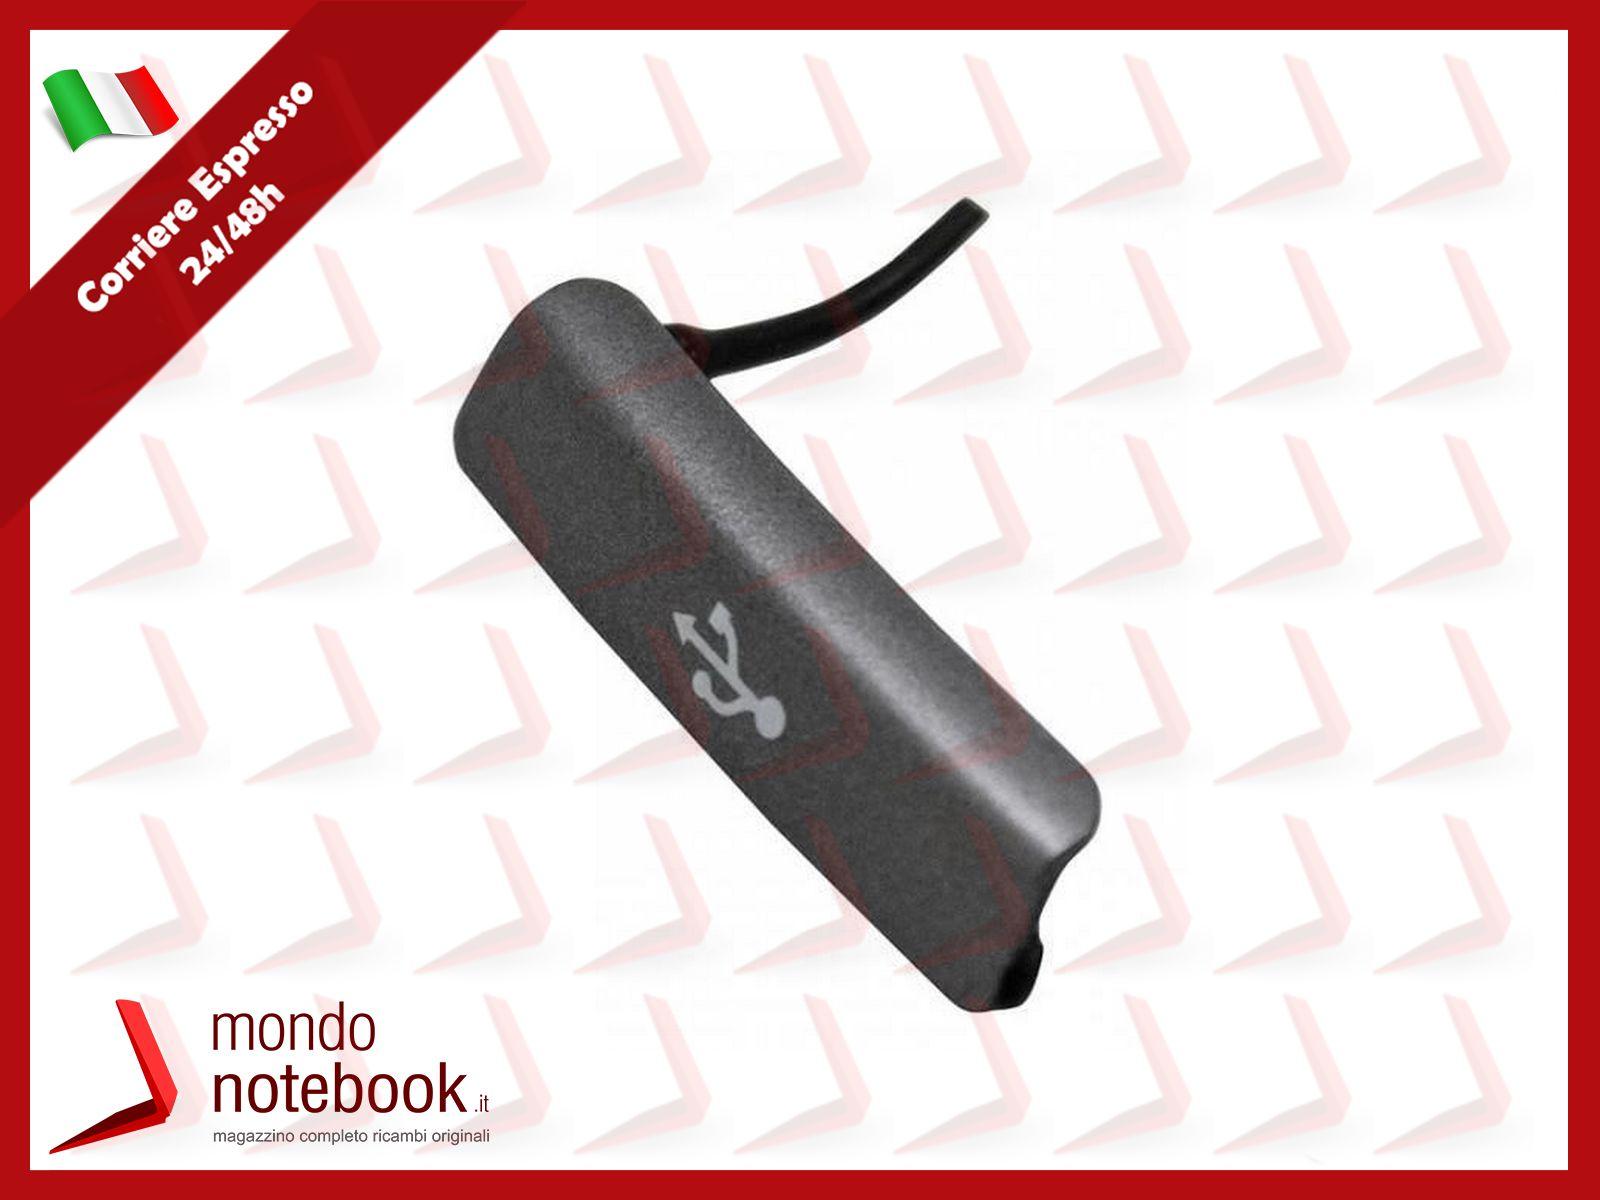 https://www.mondonotebook.it/10621/batteria-compatibile-alta-qualit-apple-macbook-pro-15-a1286-2009-2010.jpg